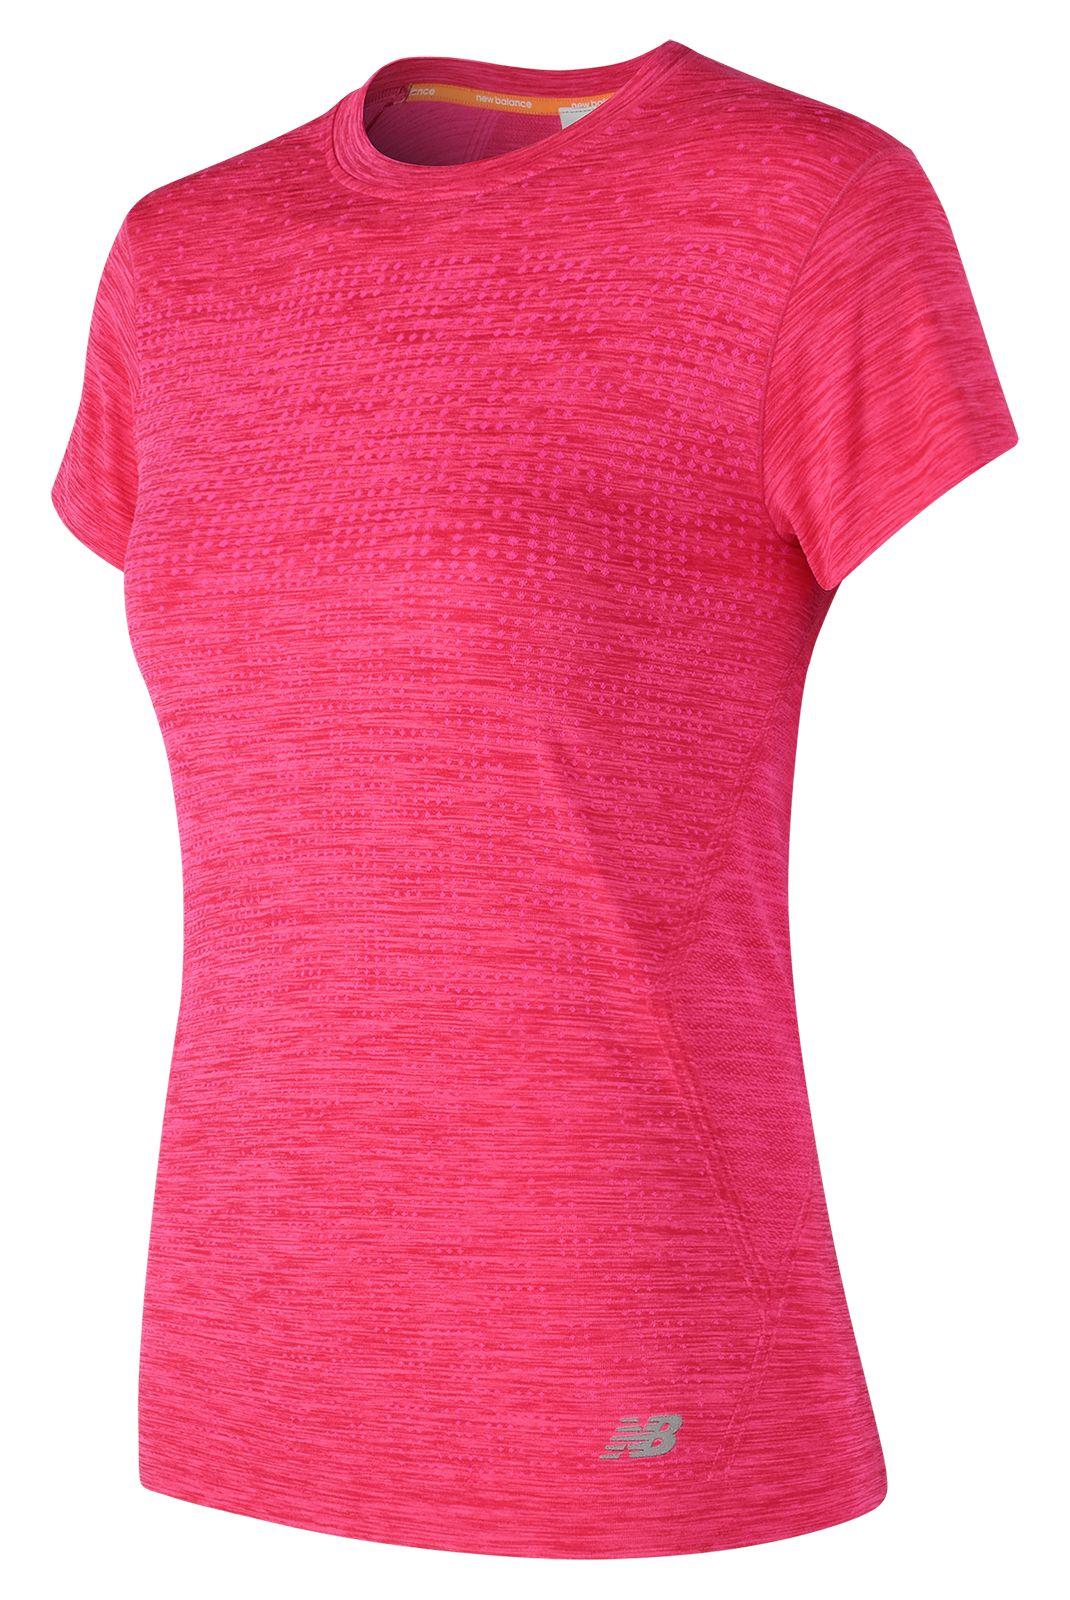 NB M4M Seamless Short Sleeve, Alpha Pink Heather